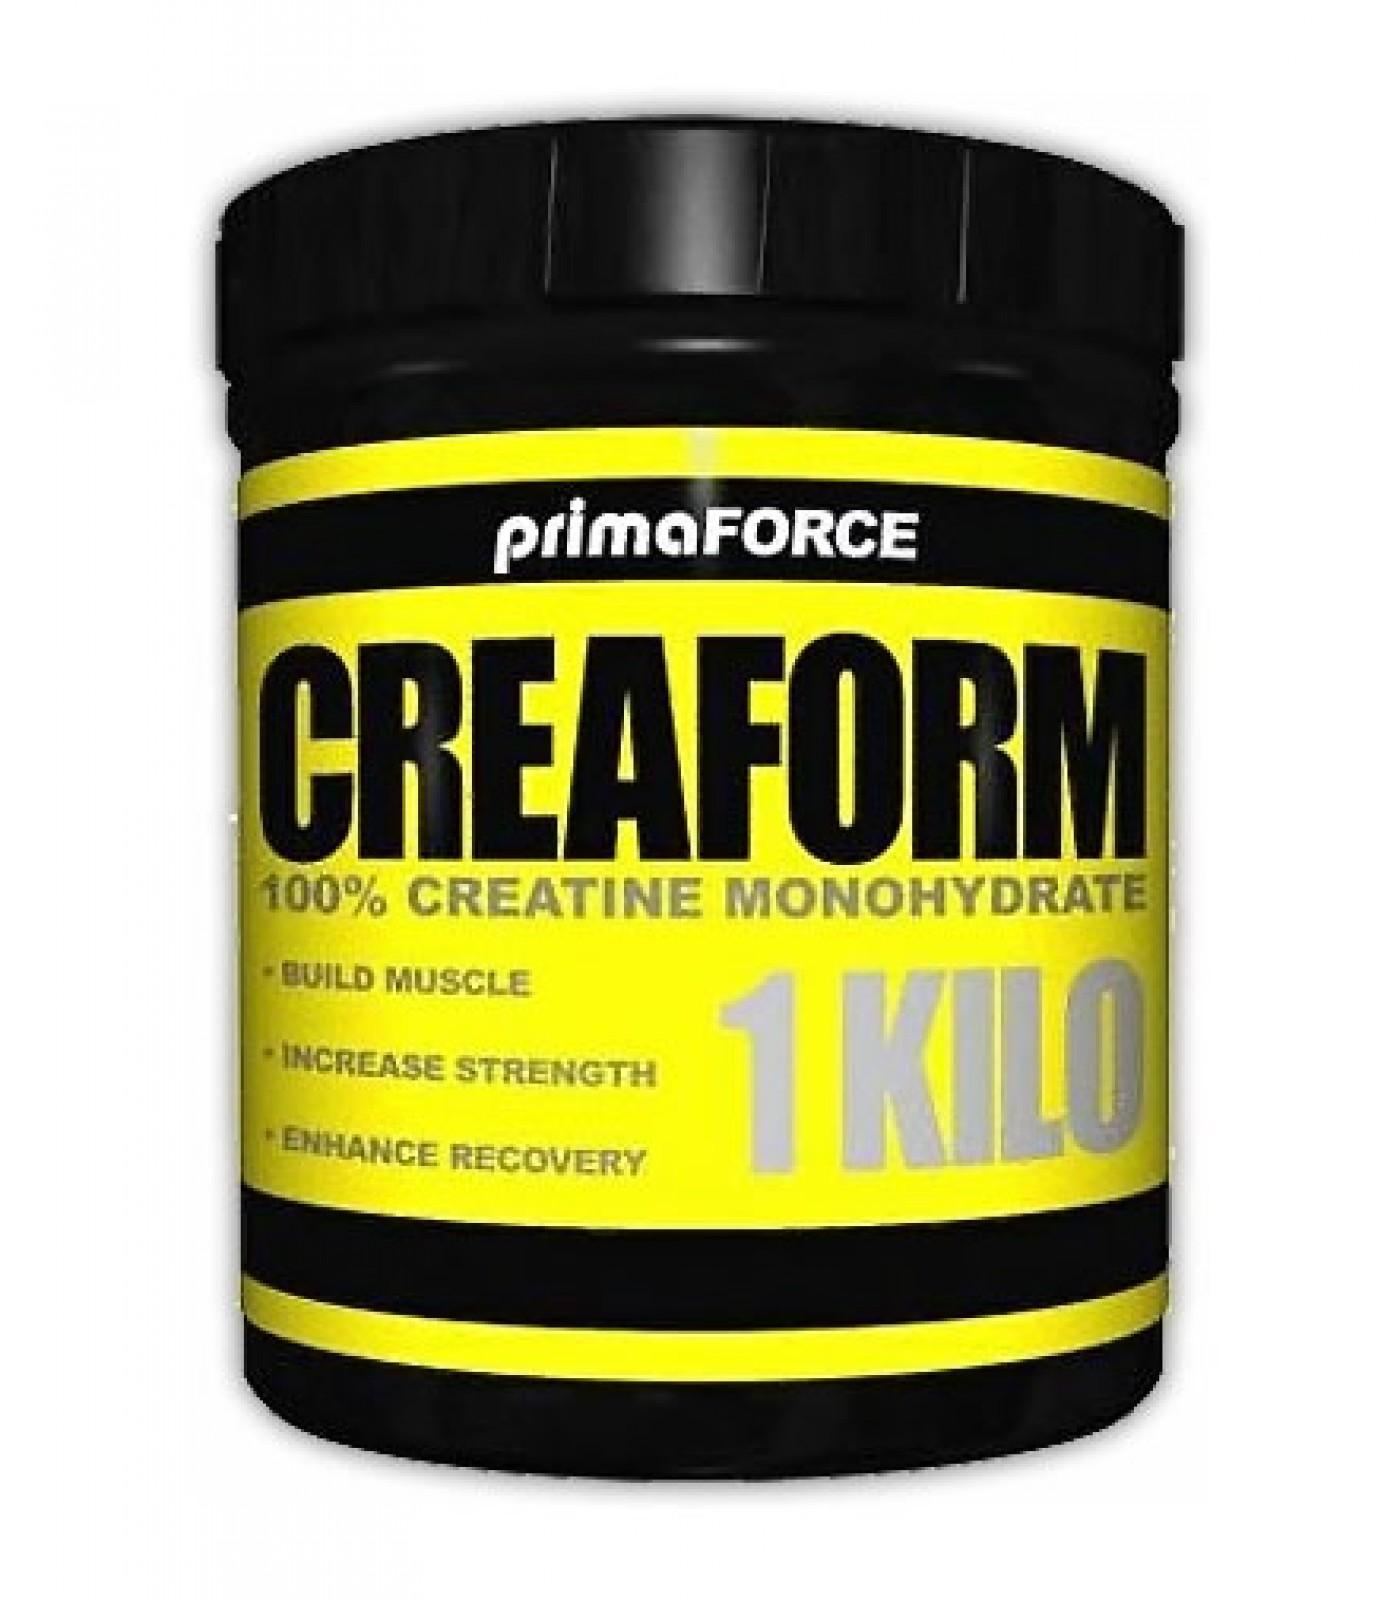 Primaforce - Creaform / 1000 gr